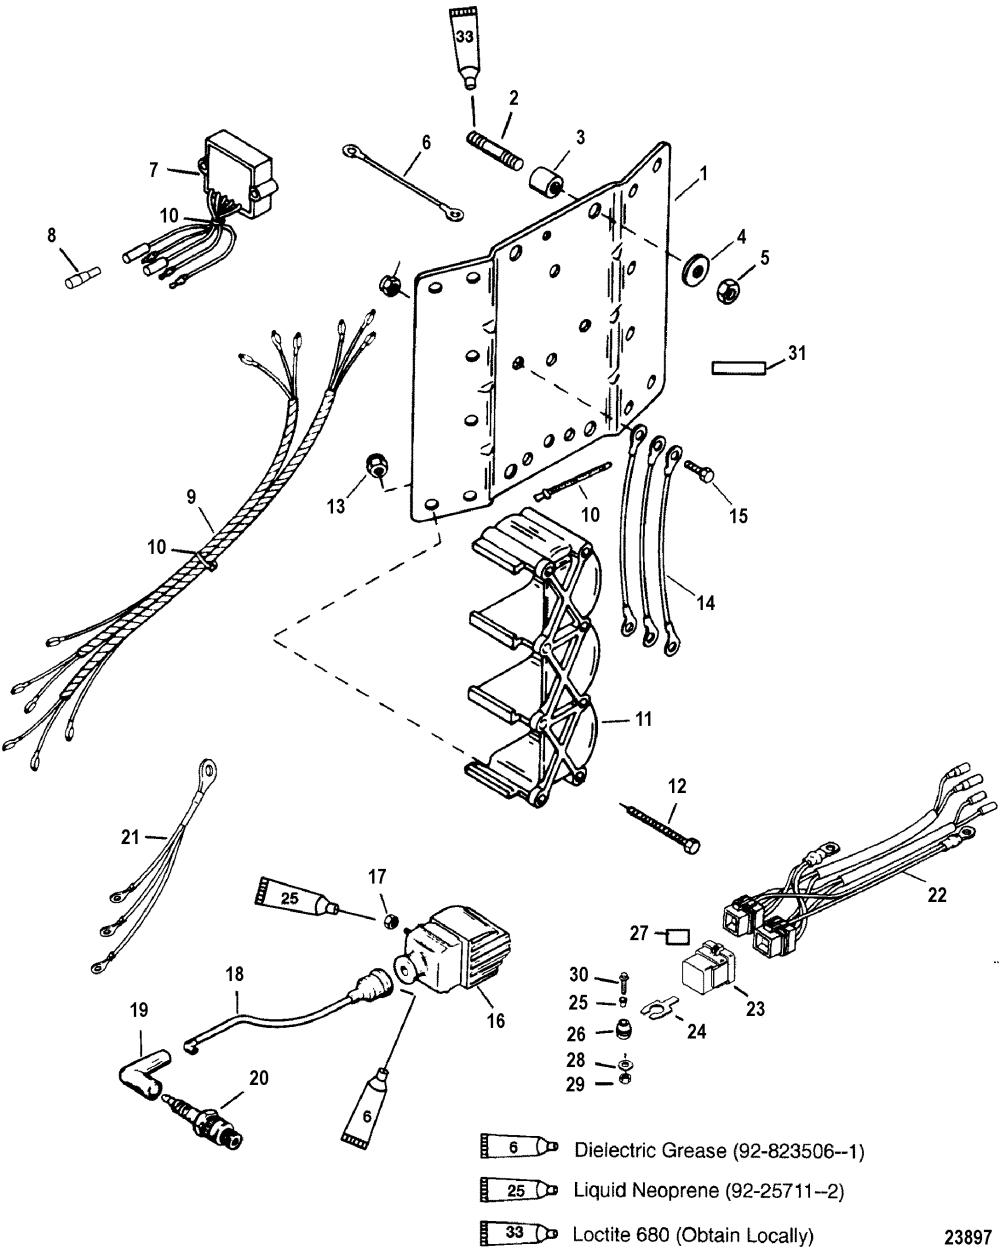 medium resolution of ignition coil voltage regulator for mariner mercury 135 60 hp mercury outboard wiring diagram mercury outboard wiring harness diagram